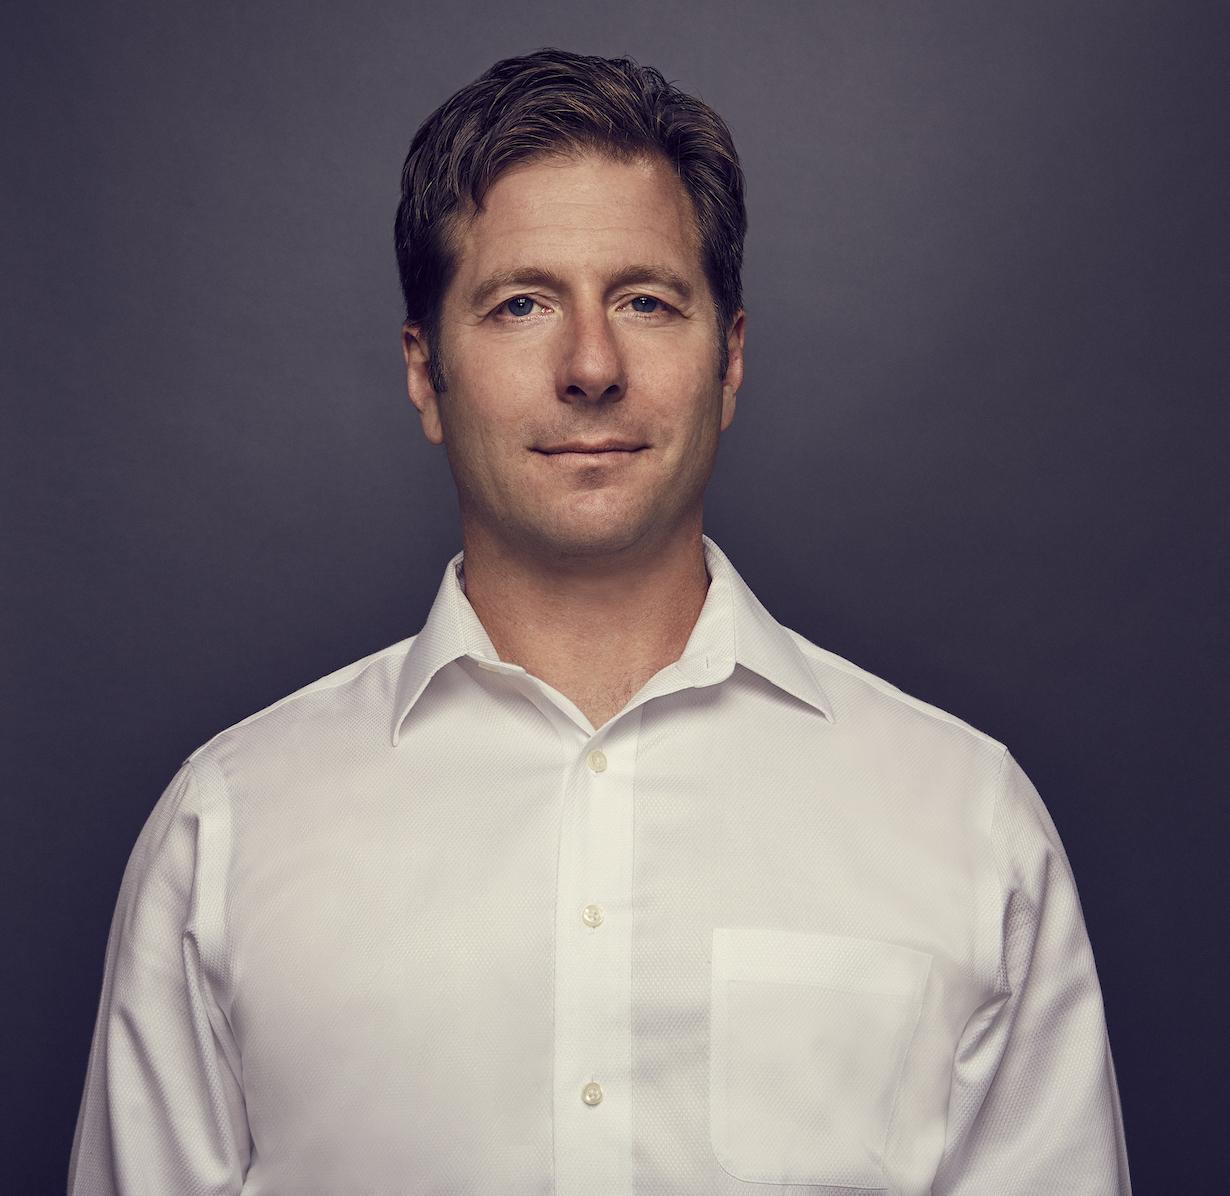 Josh Stein, CEO of Harbor